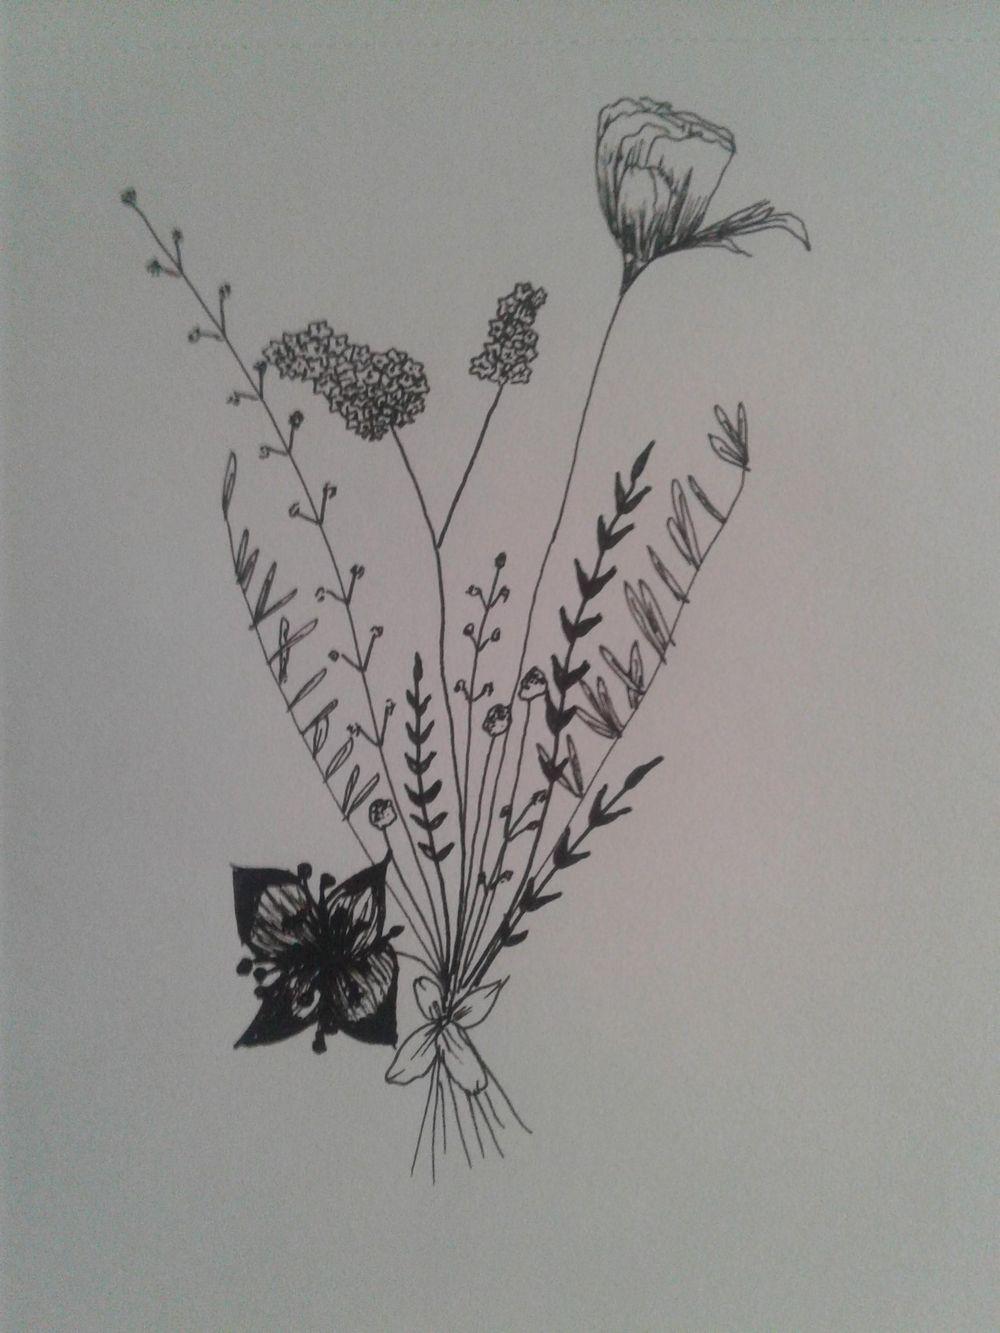 Floral Doodles - image 4 - student project